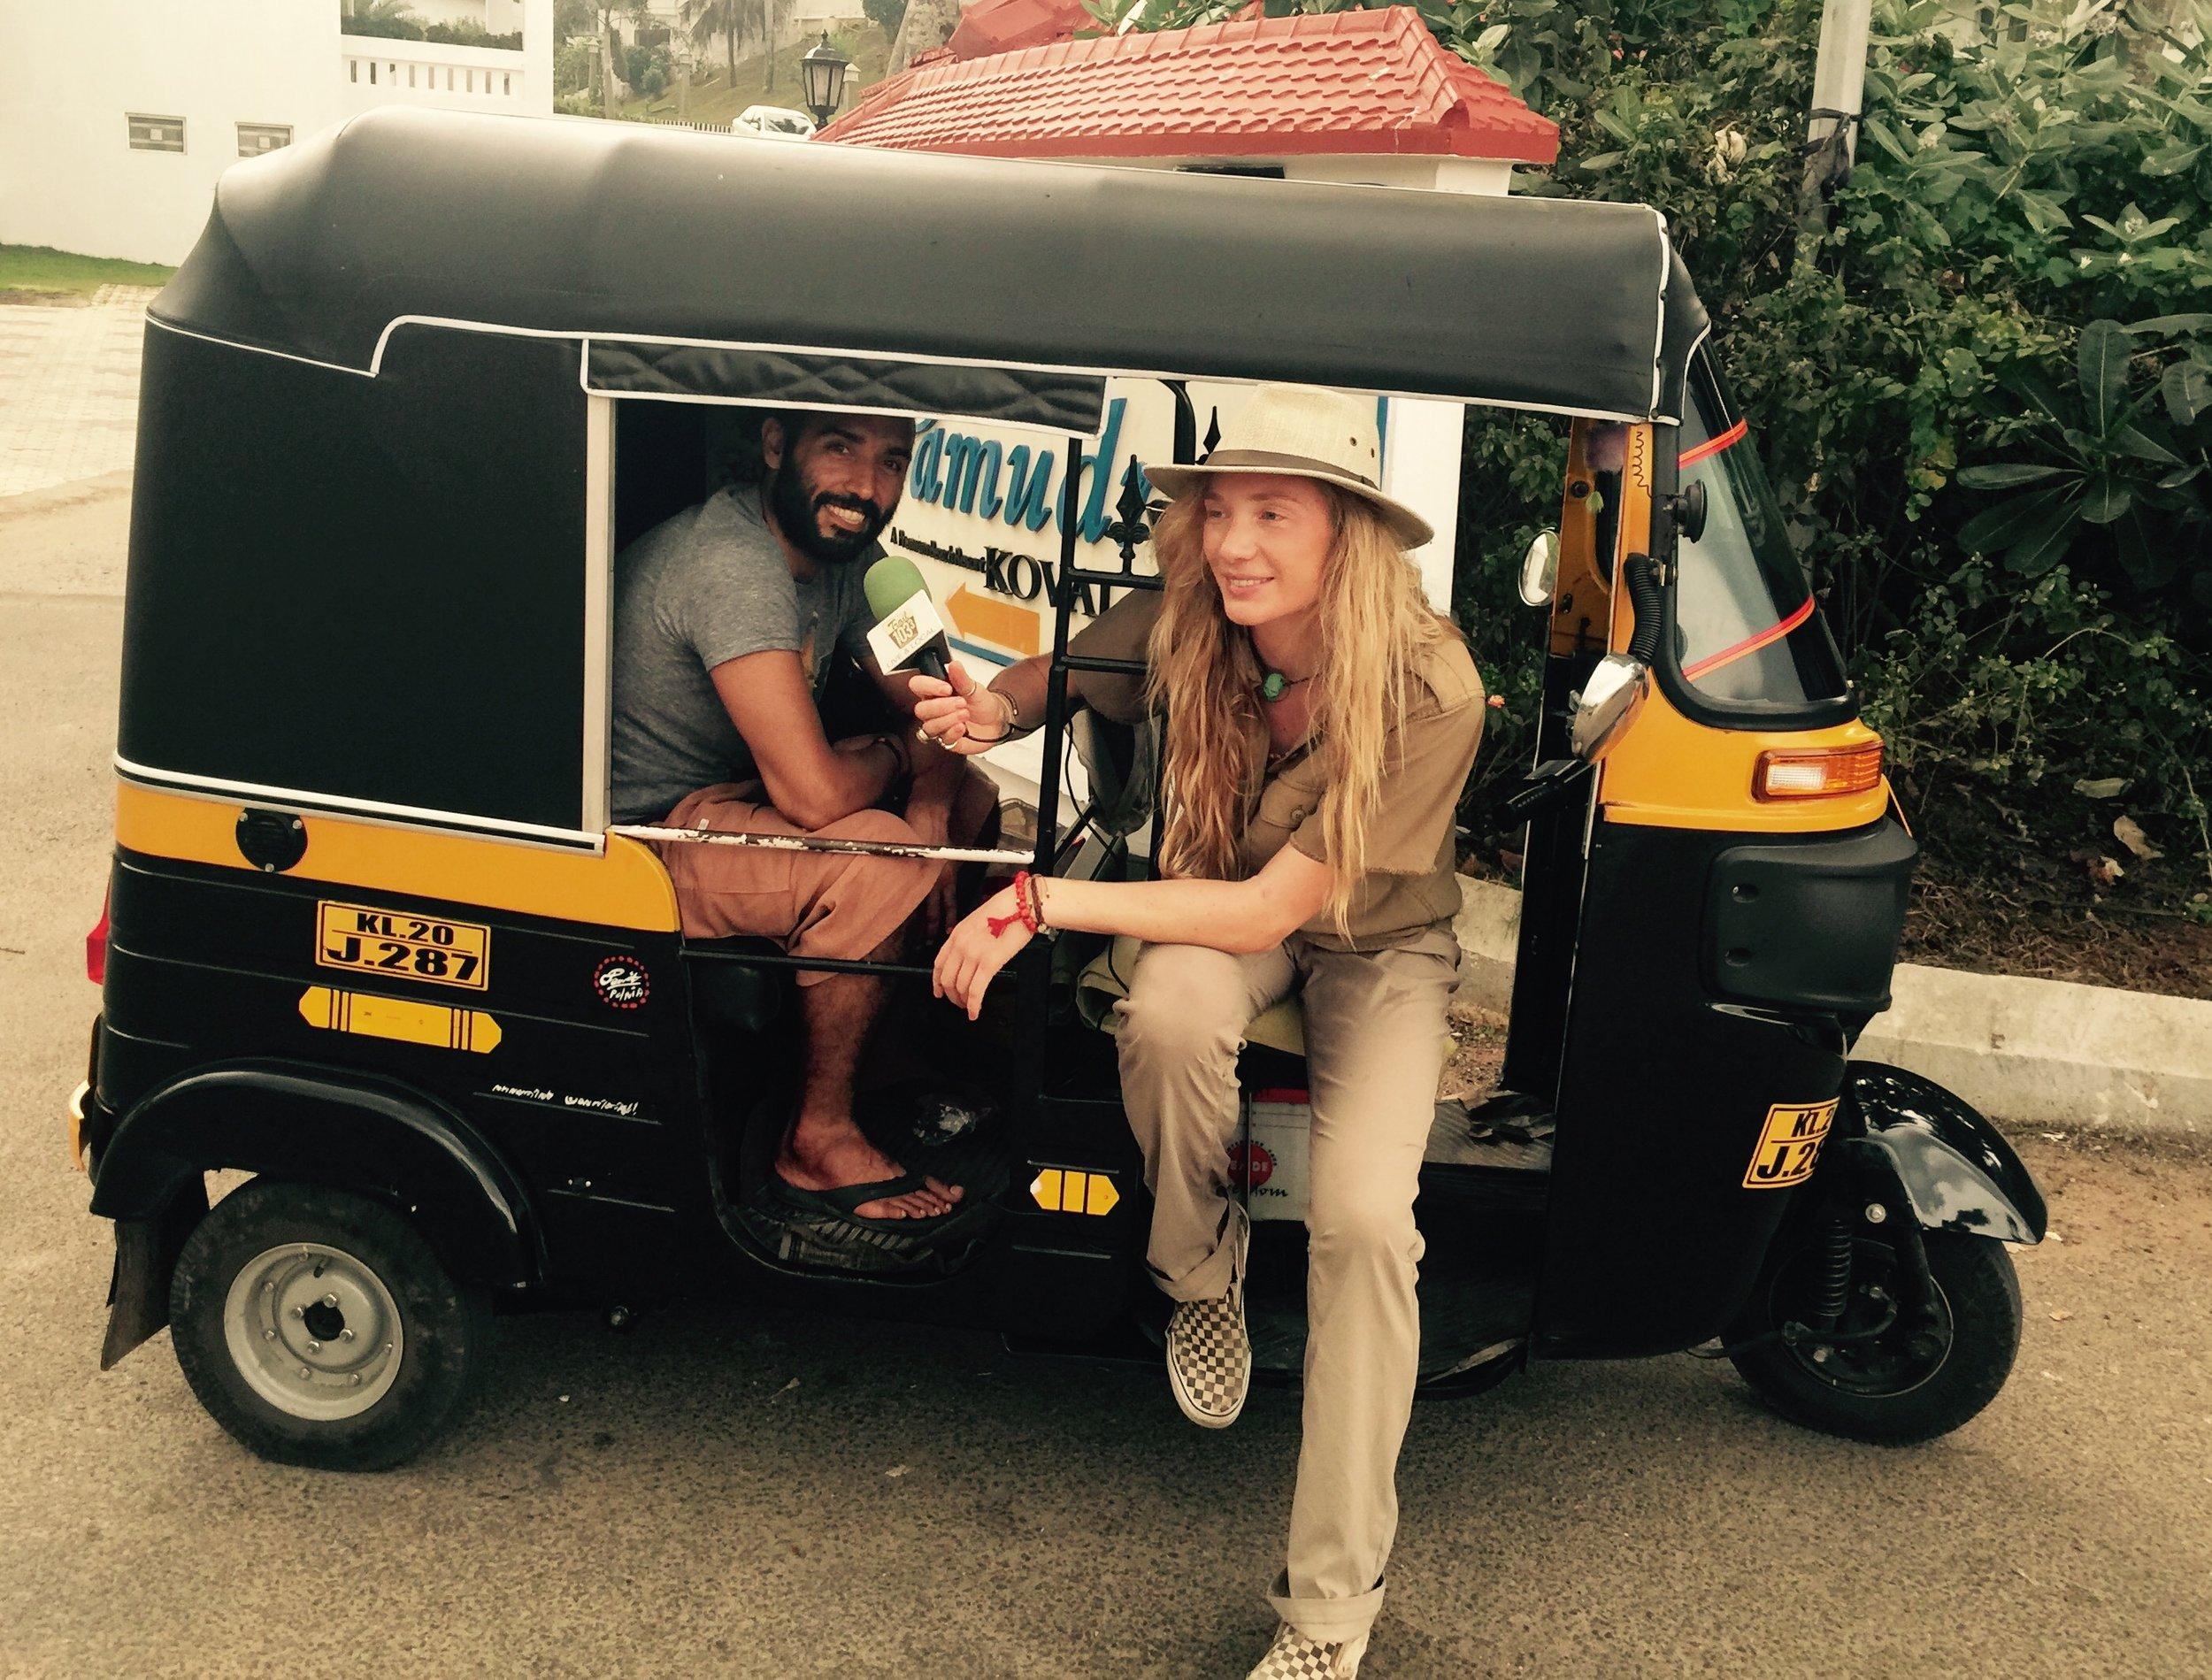 Interviewing Amir Izadi in a ricksha navigating the busy streets near Samudra Beach in Kerala, South India.